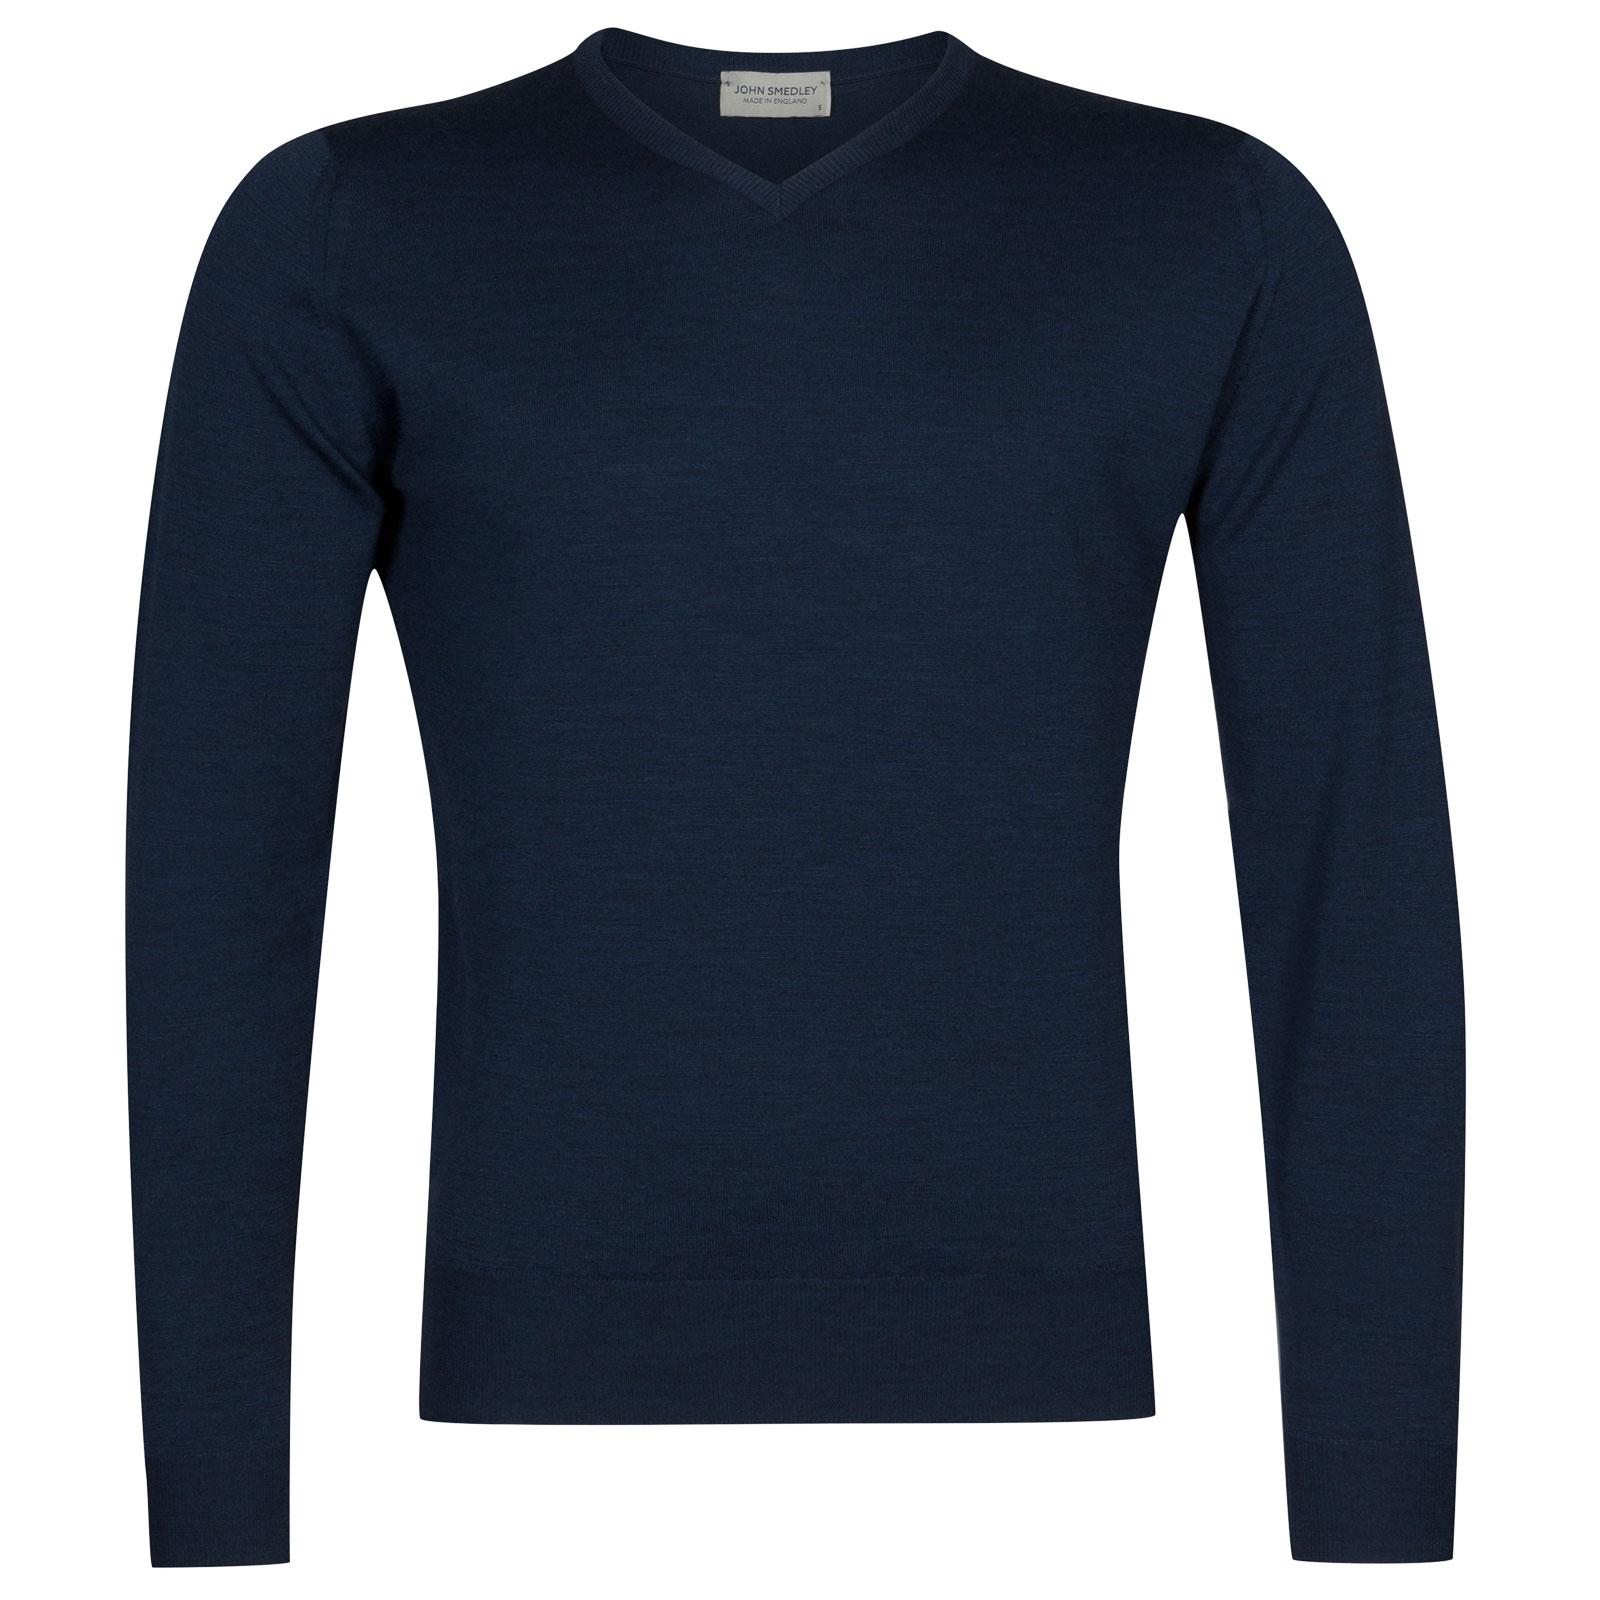 John Smedley Genoa Merino Wool Pullover in Indigo-XXL